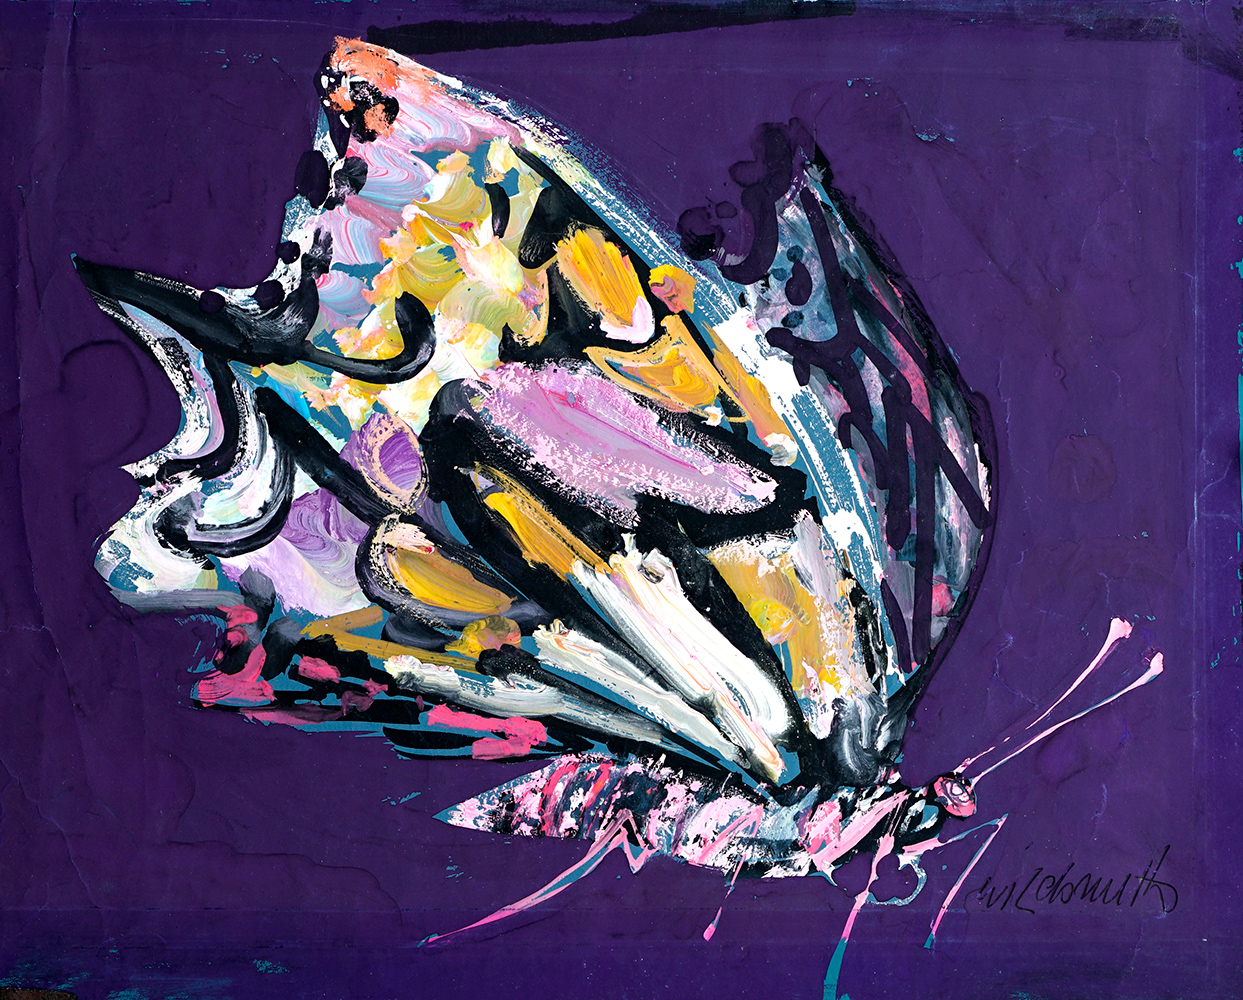 Butterfly-original-illustration-Brian-Wildsmith-ABC.jpg